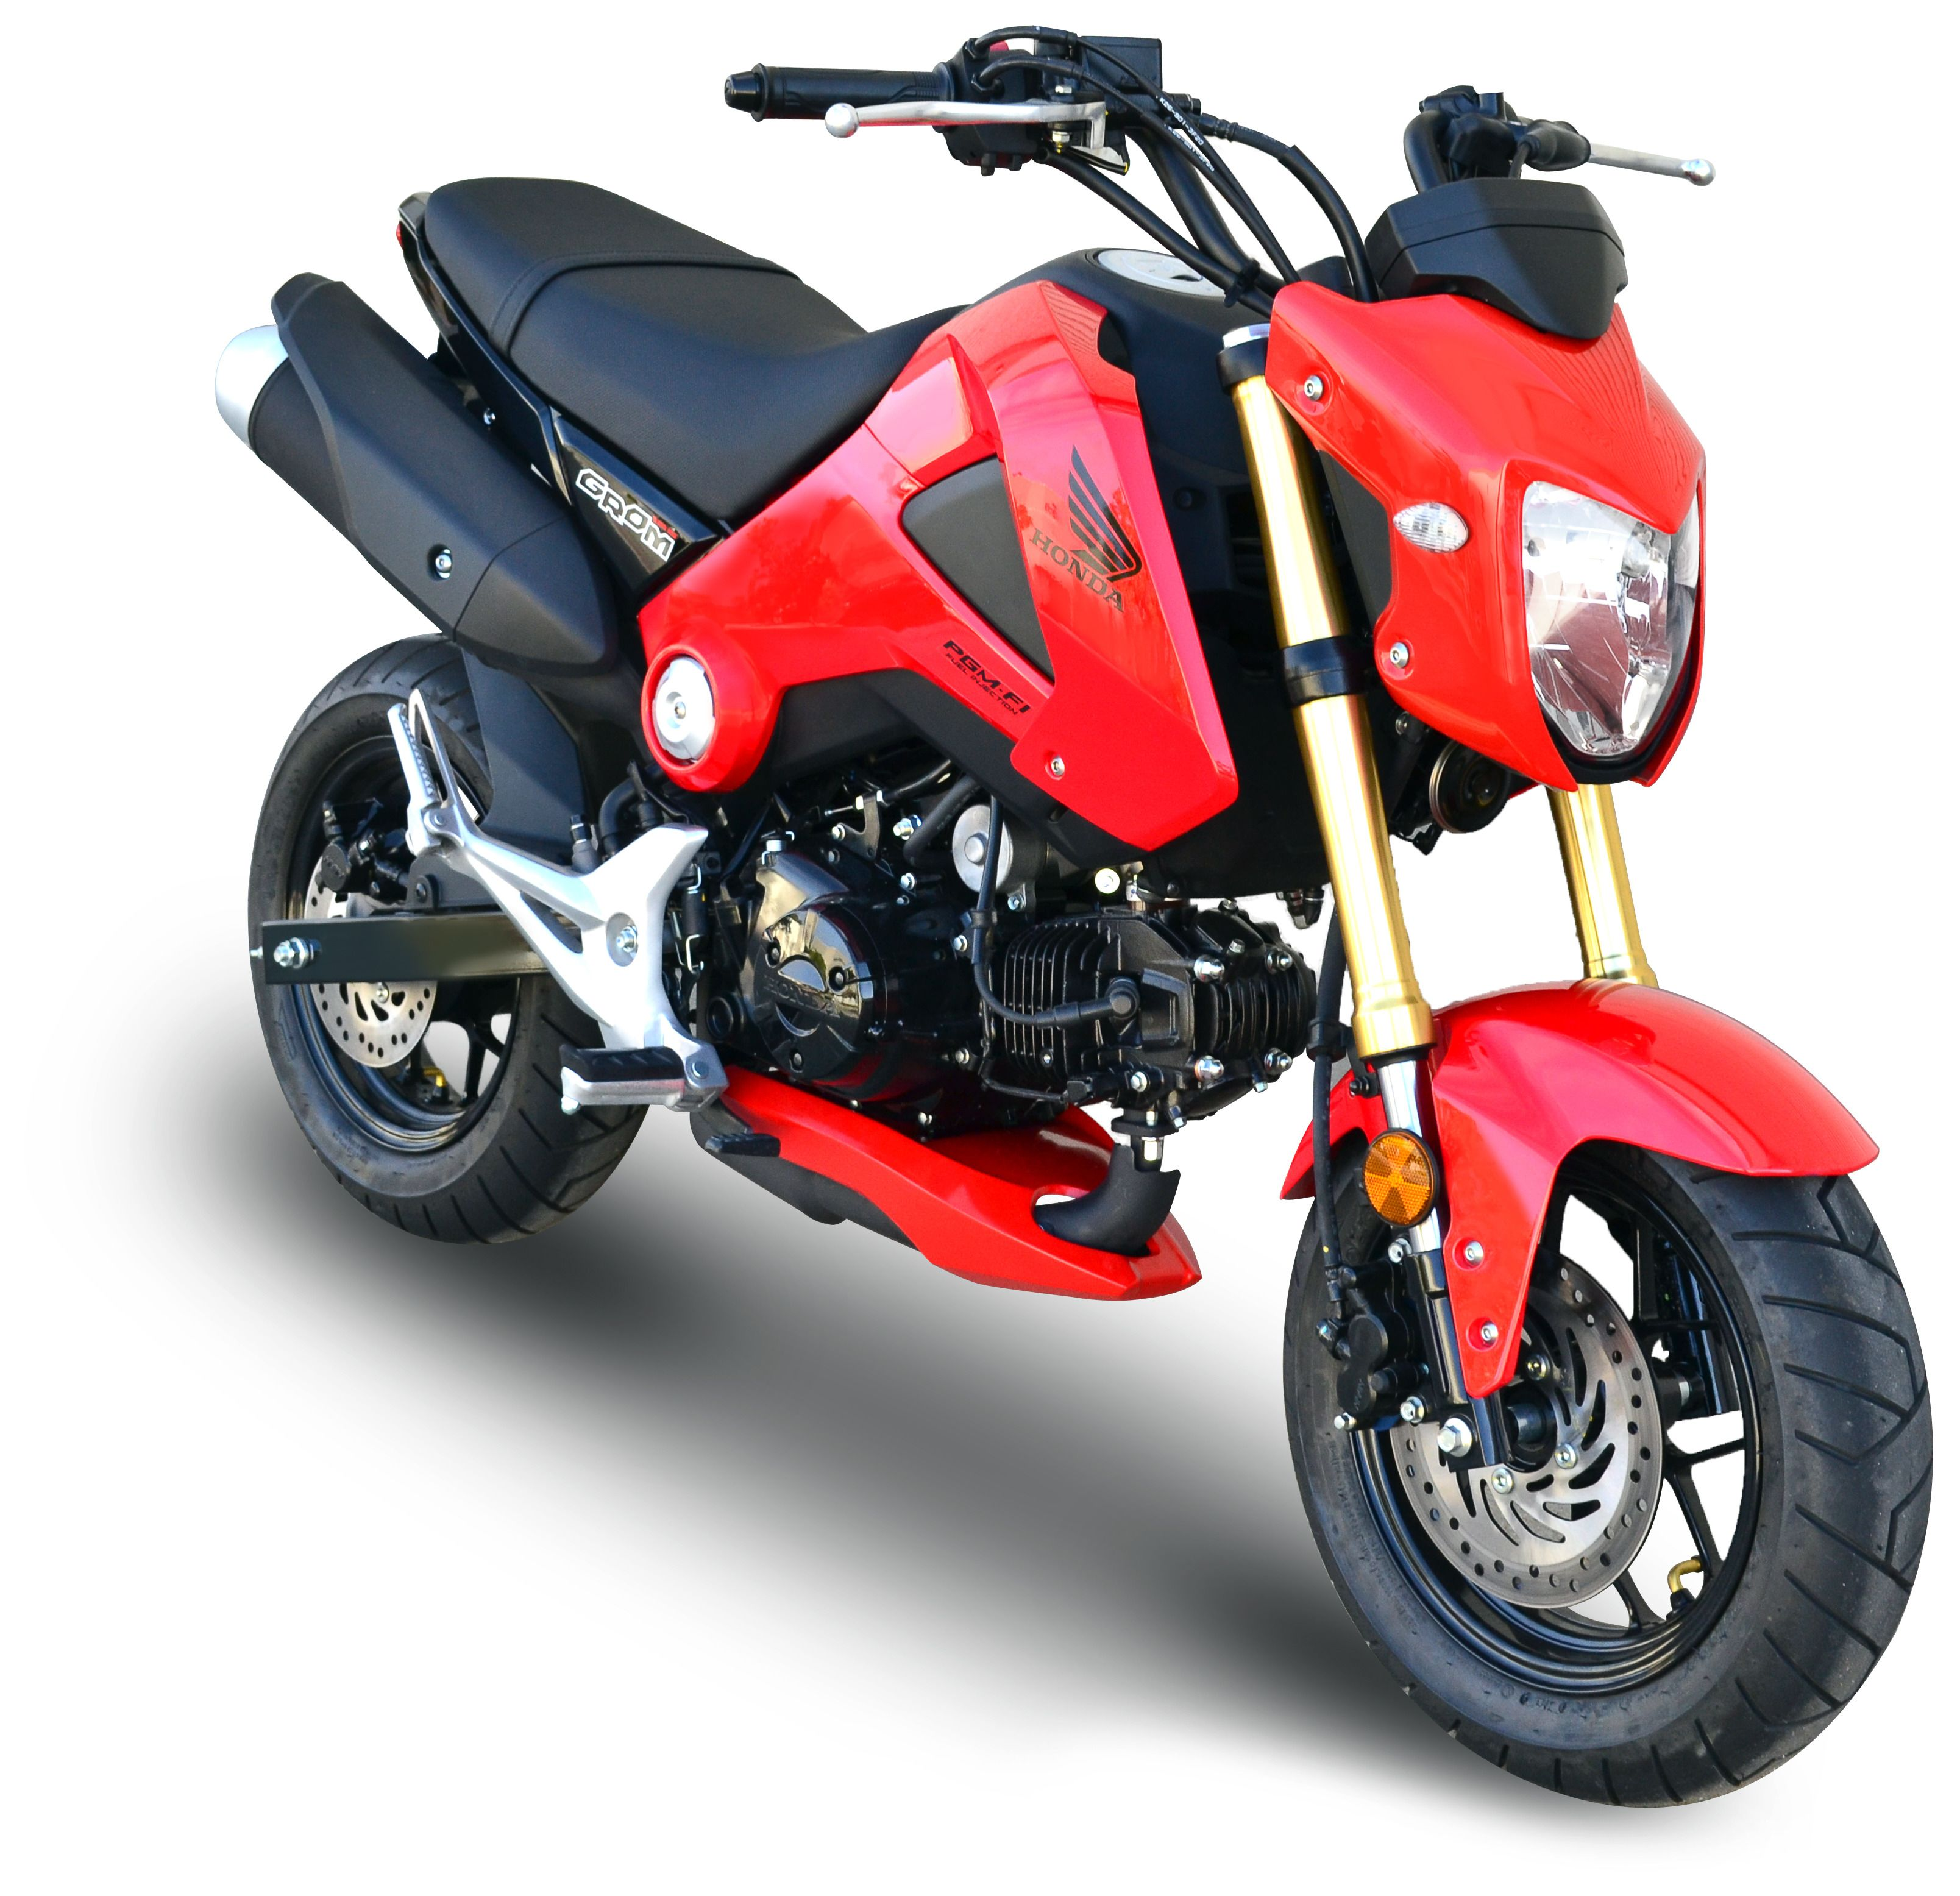 Hotbodies Custom Lower Fairing Honda Grom 2014 2020 Cycle Gear